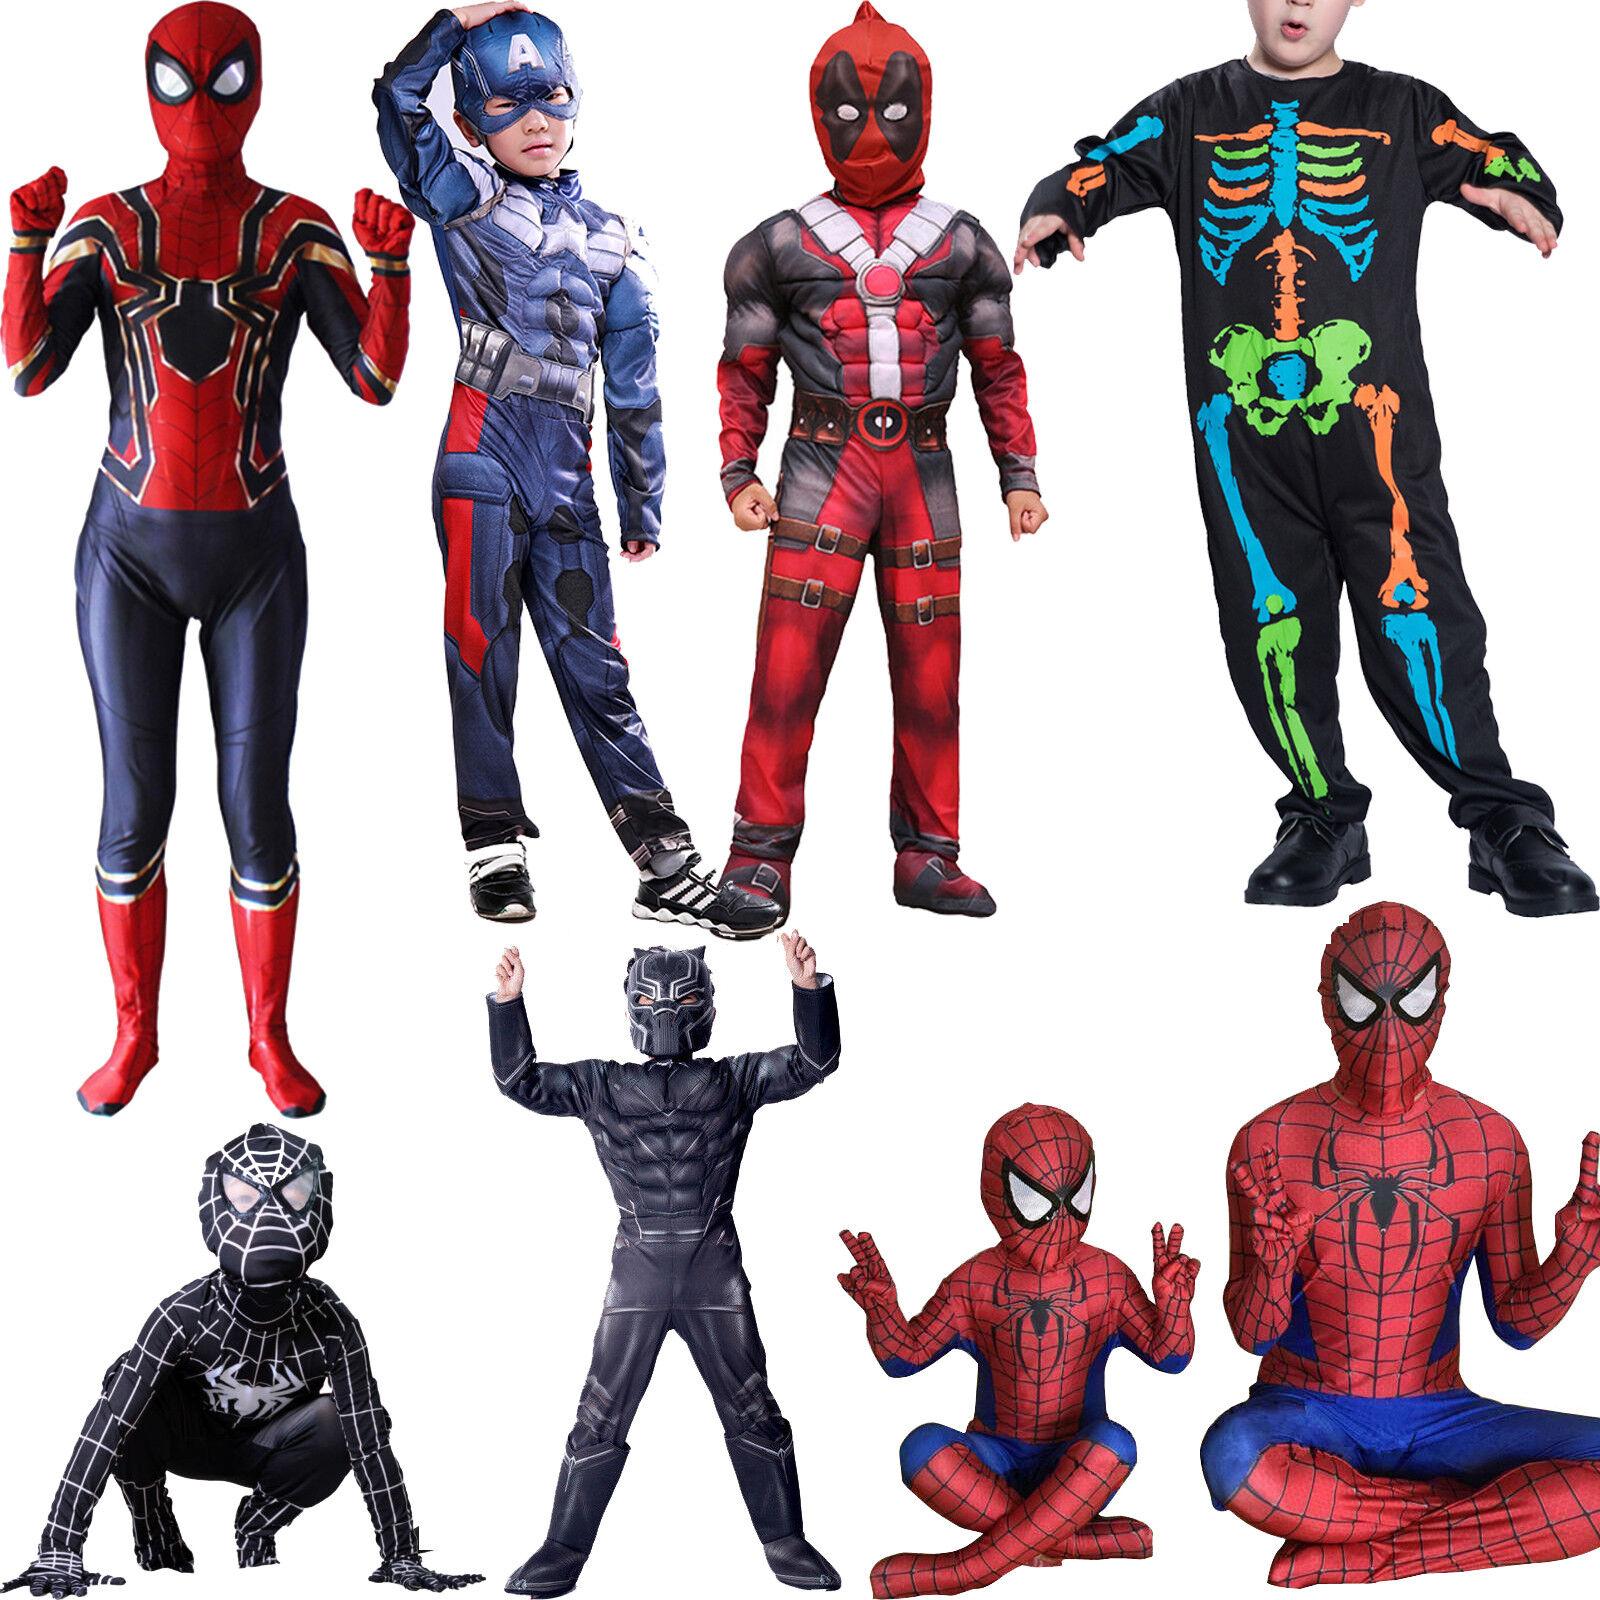 Kids Boy Superhero Spiderman Deadpool Marvel Costume Cosplay Fancy Dress Outfits